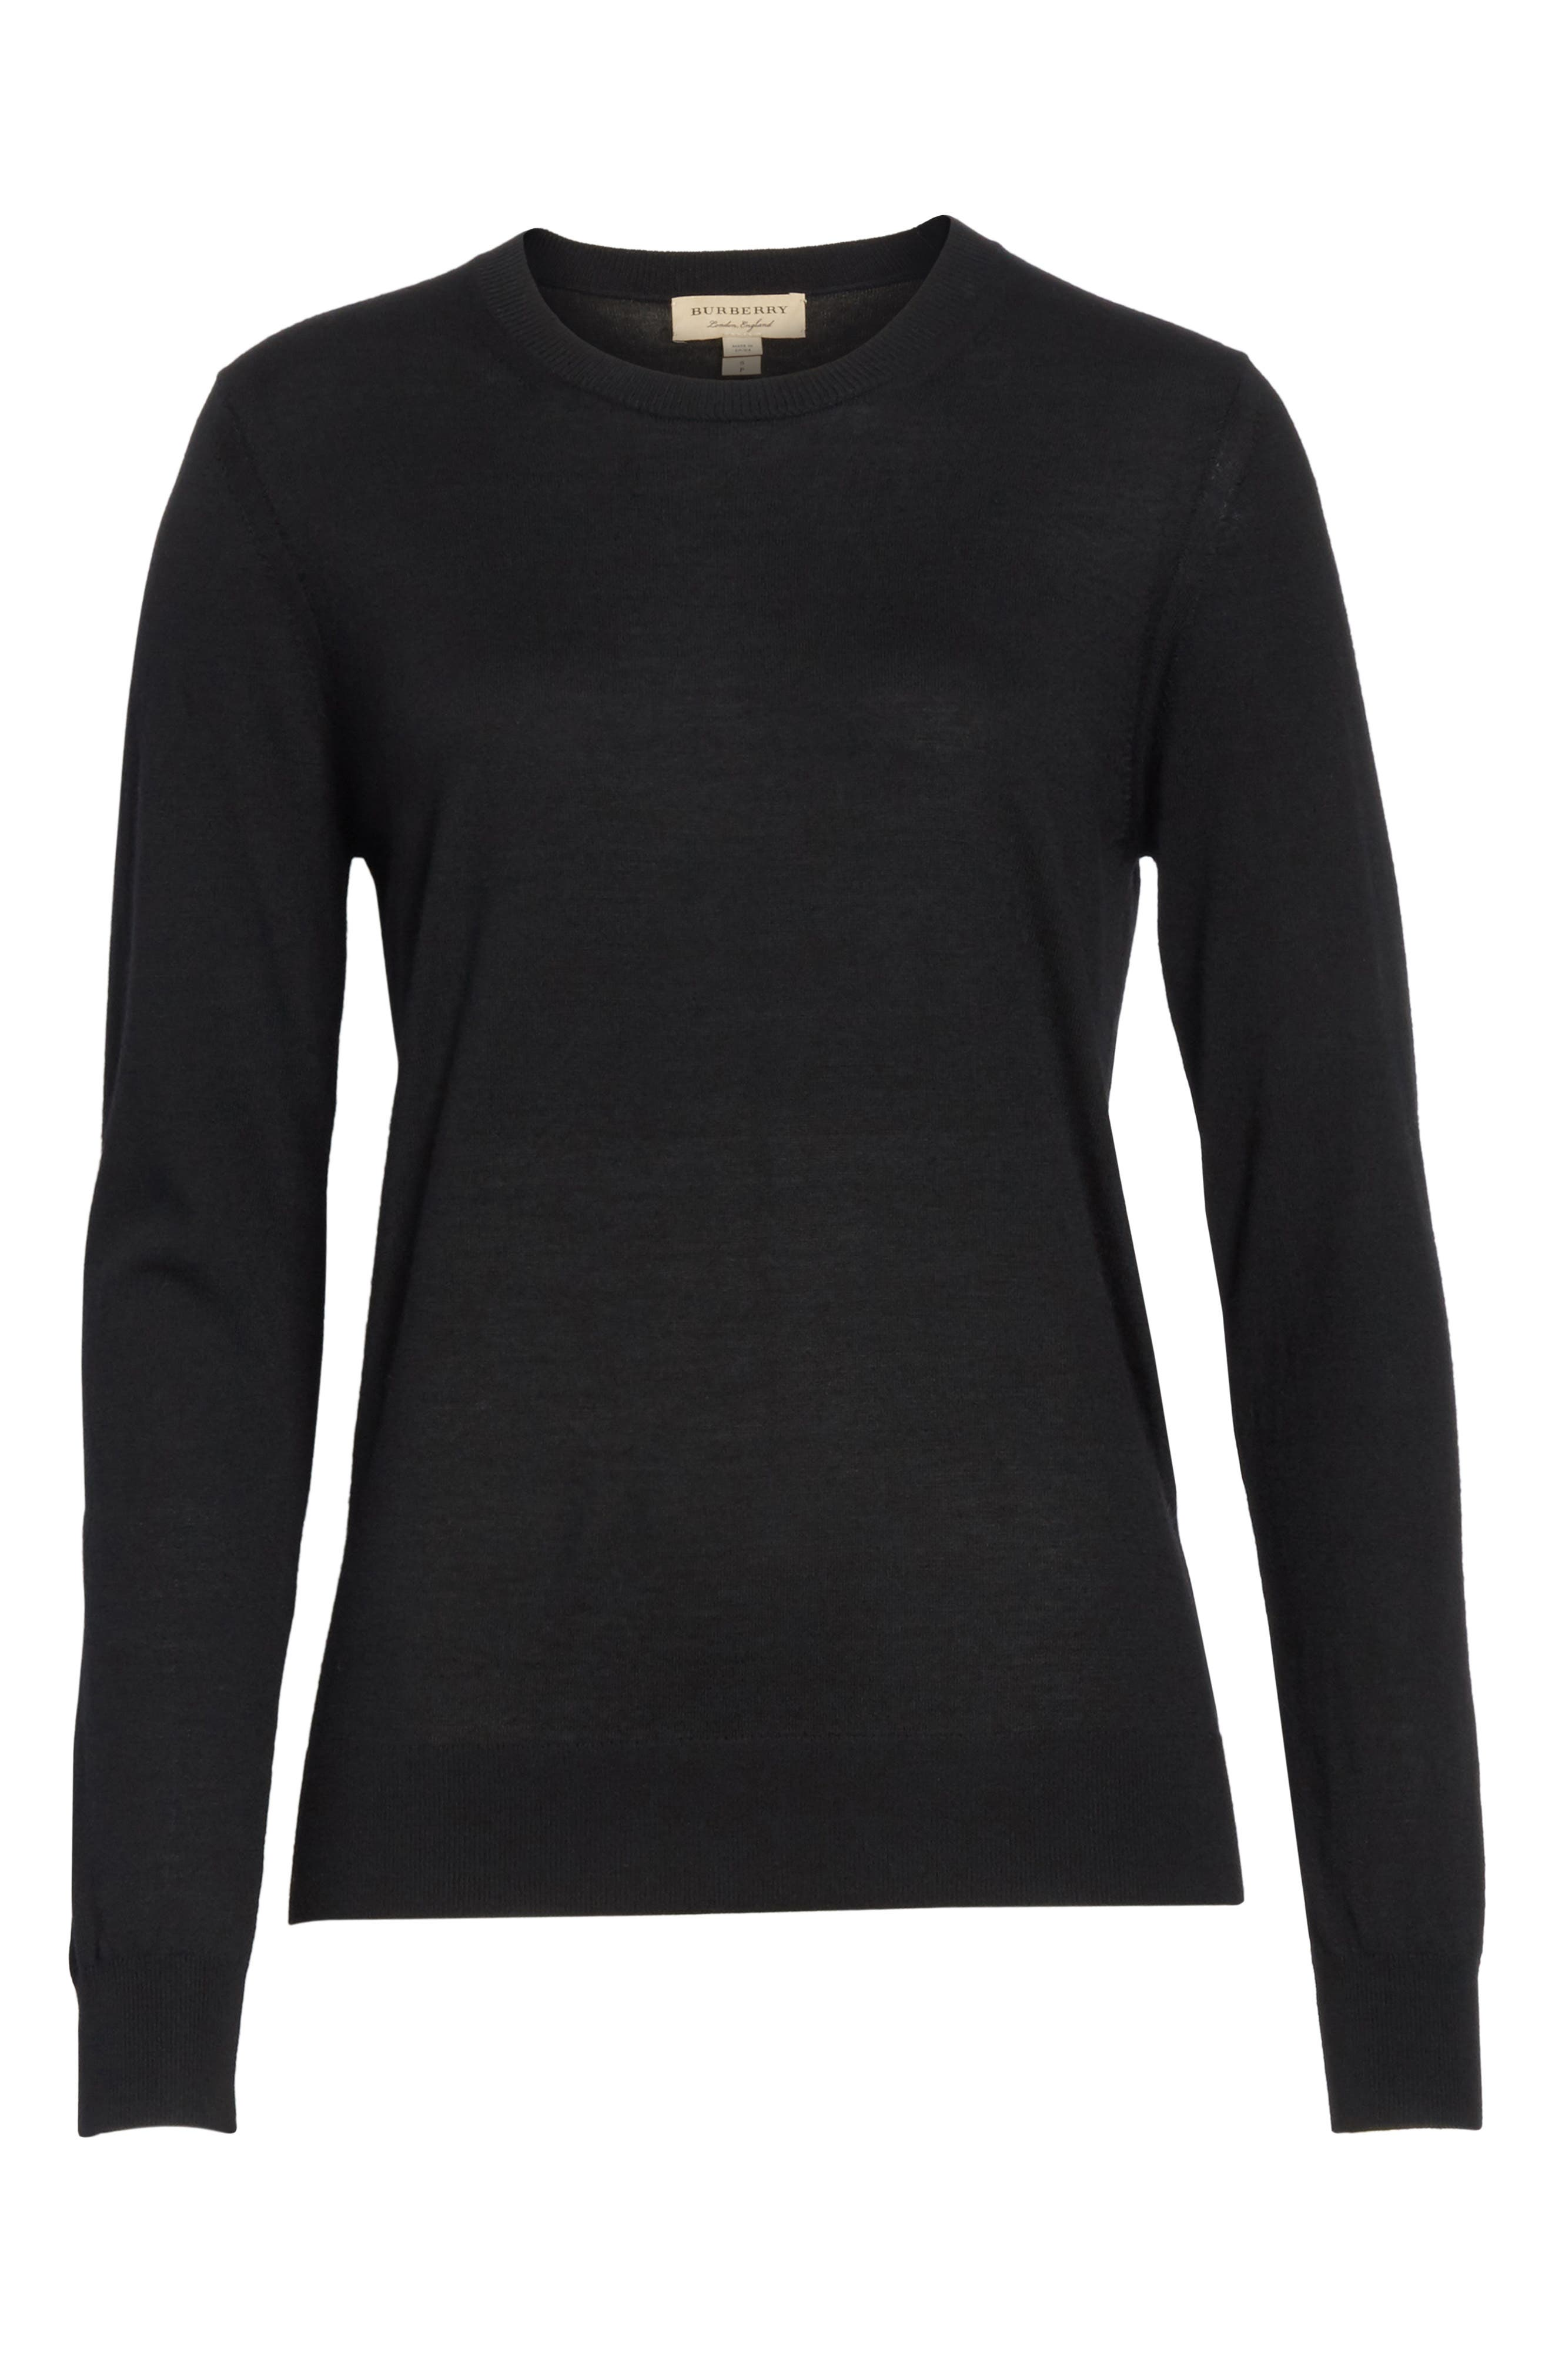 Viar Merino Wool Sweater,                             Alternate thumbnail 6, color,                             001